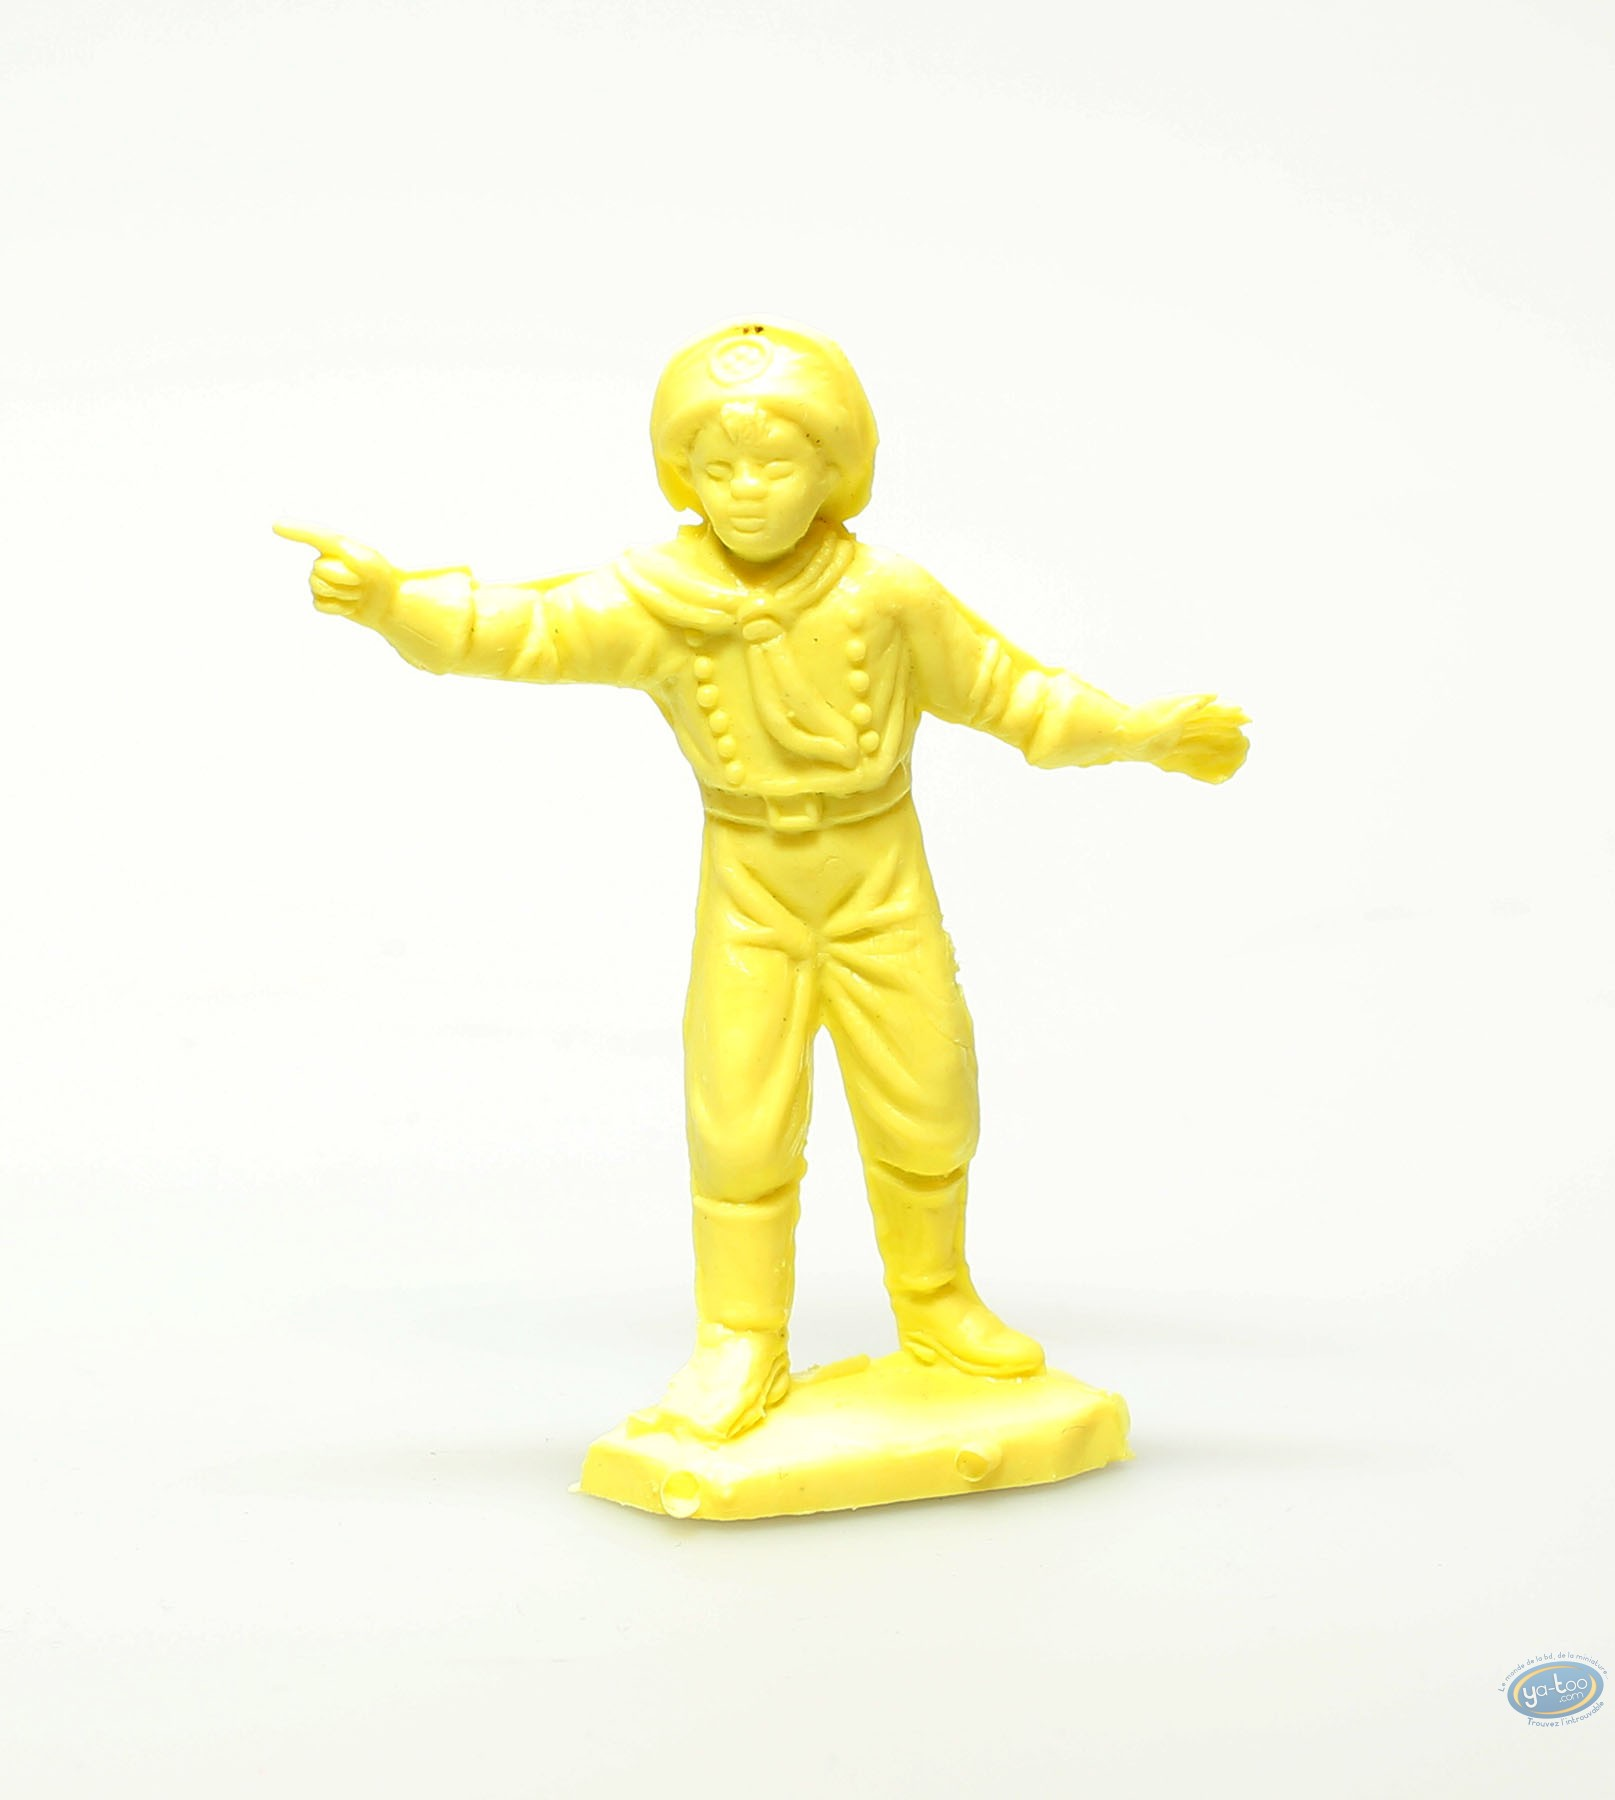 Plastic Figurine, Rintintin : Plastic figure : Young boy pointing yellow